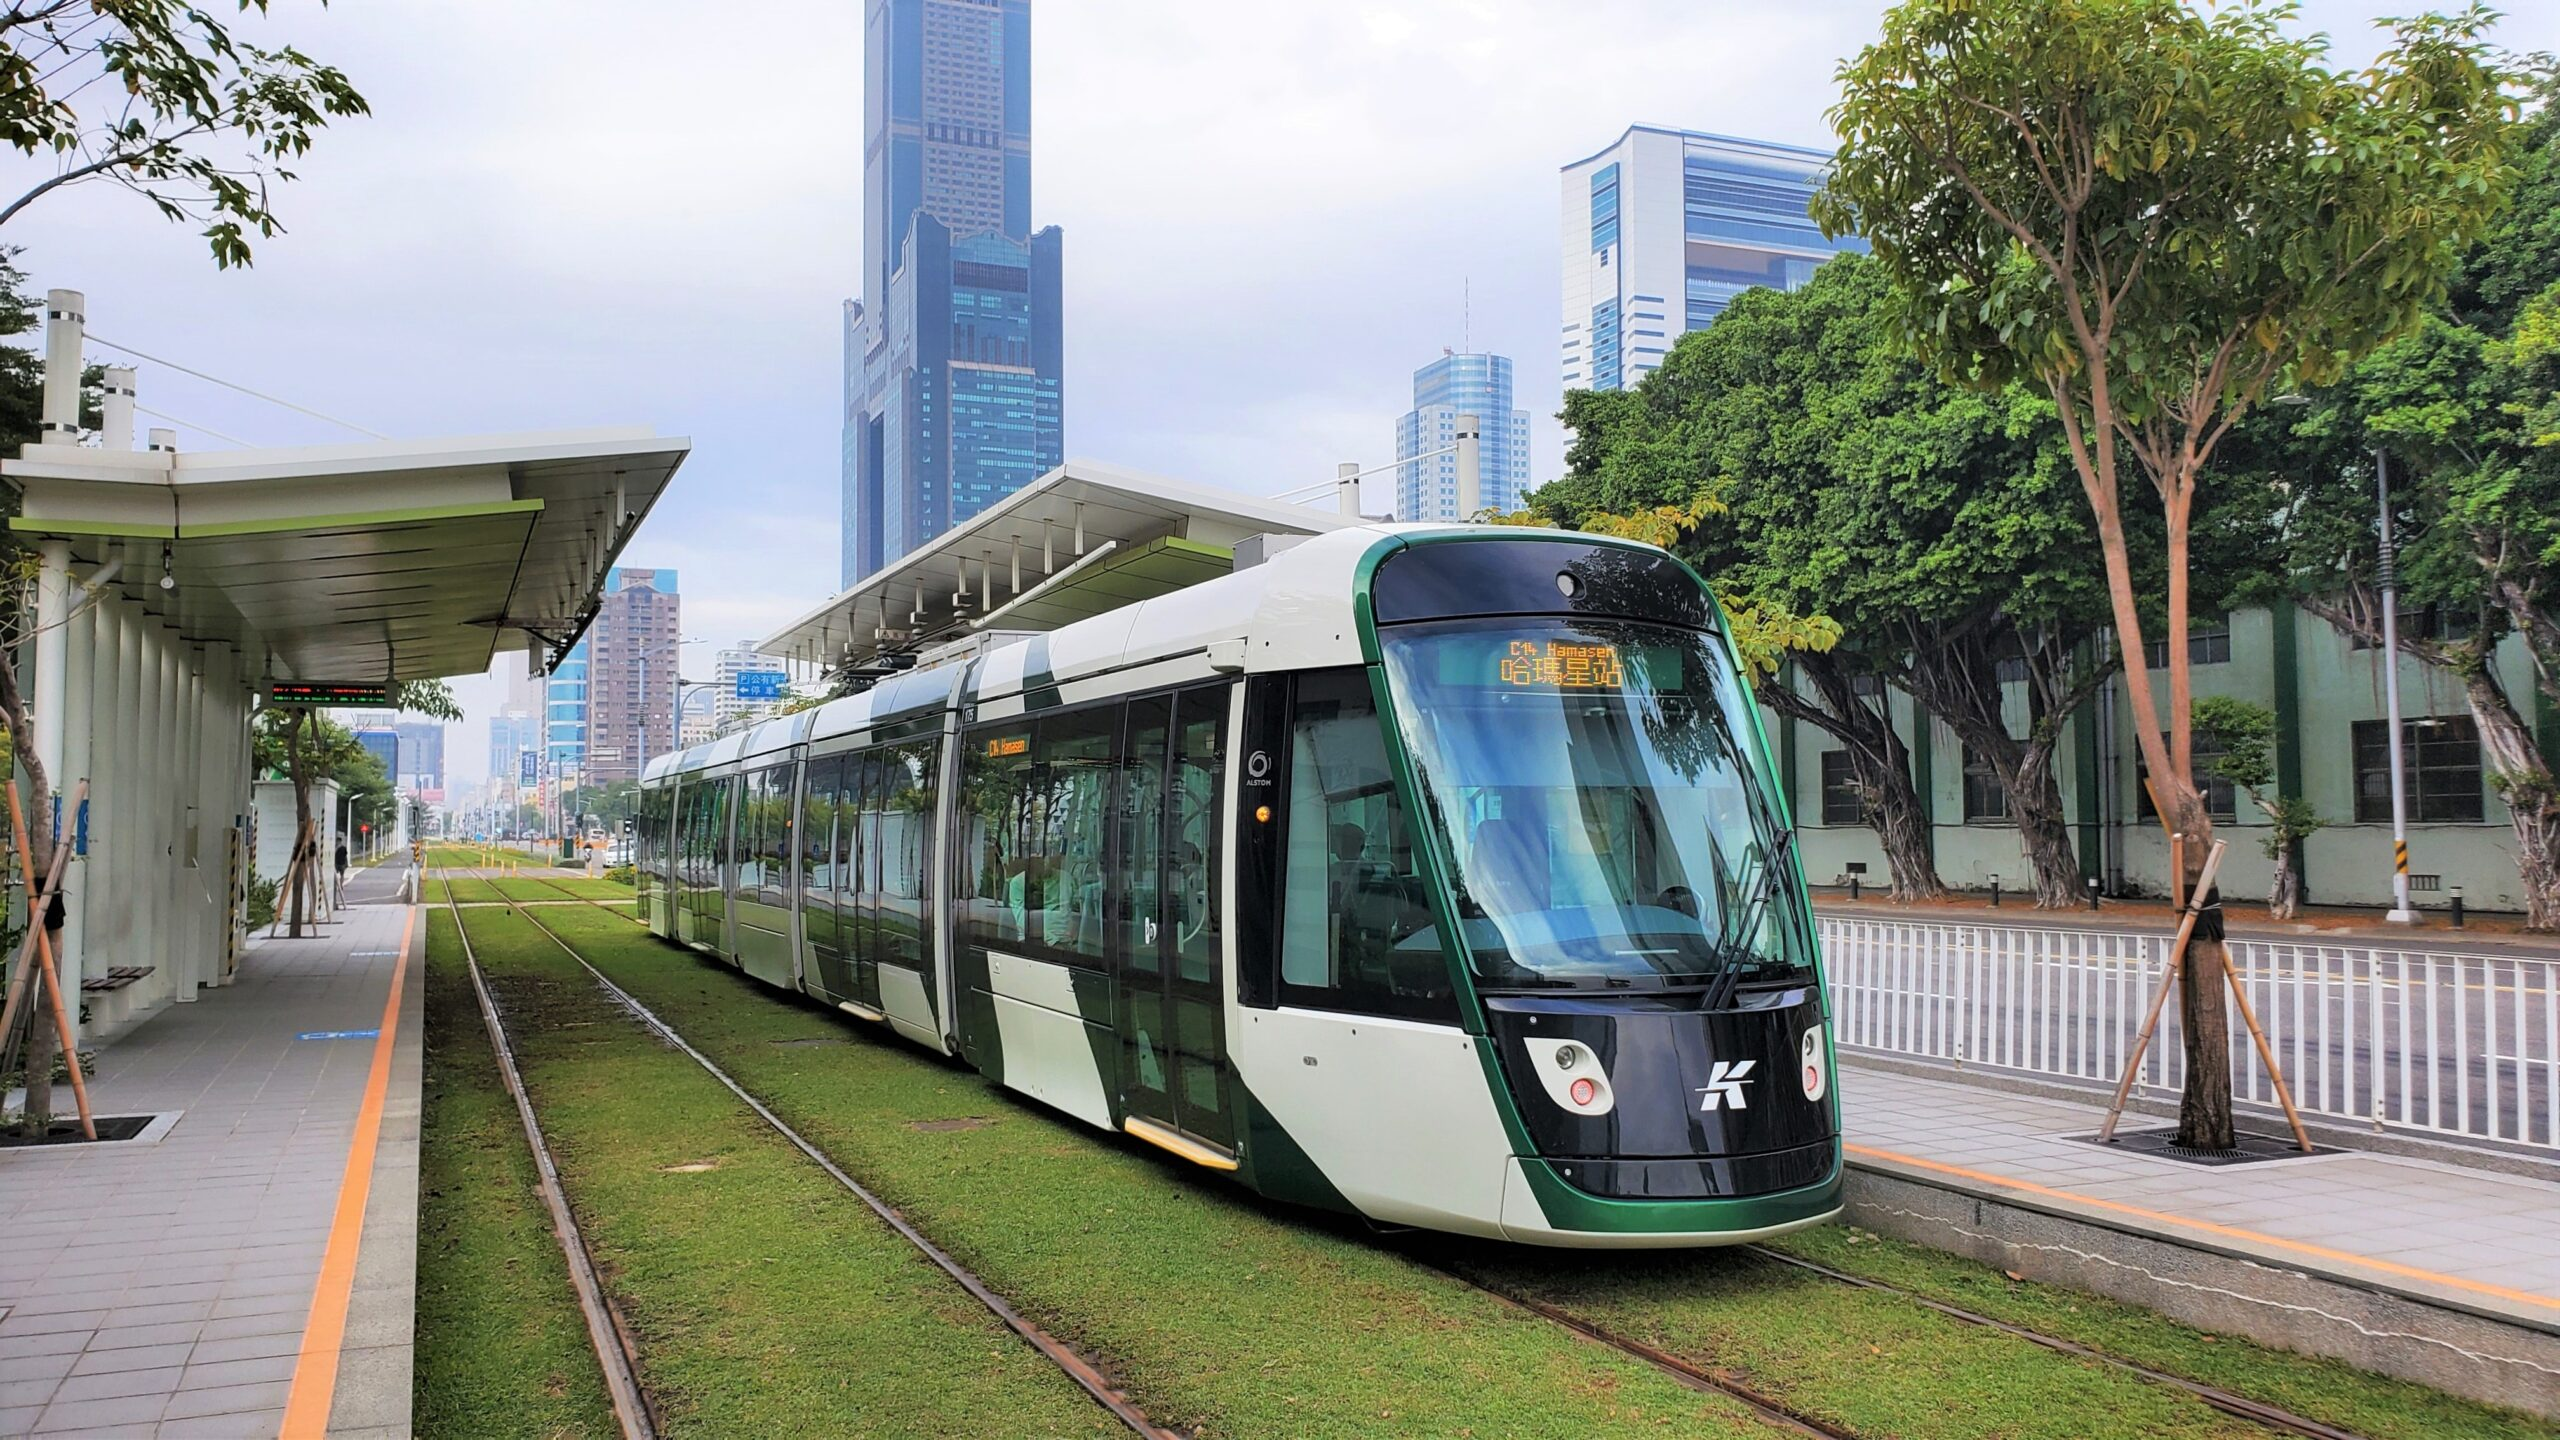 Alstom Citadis X05 tram in Kaohsiung, Taiwan